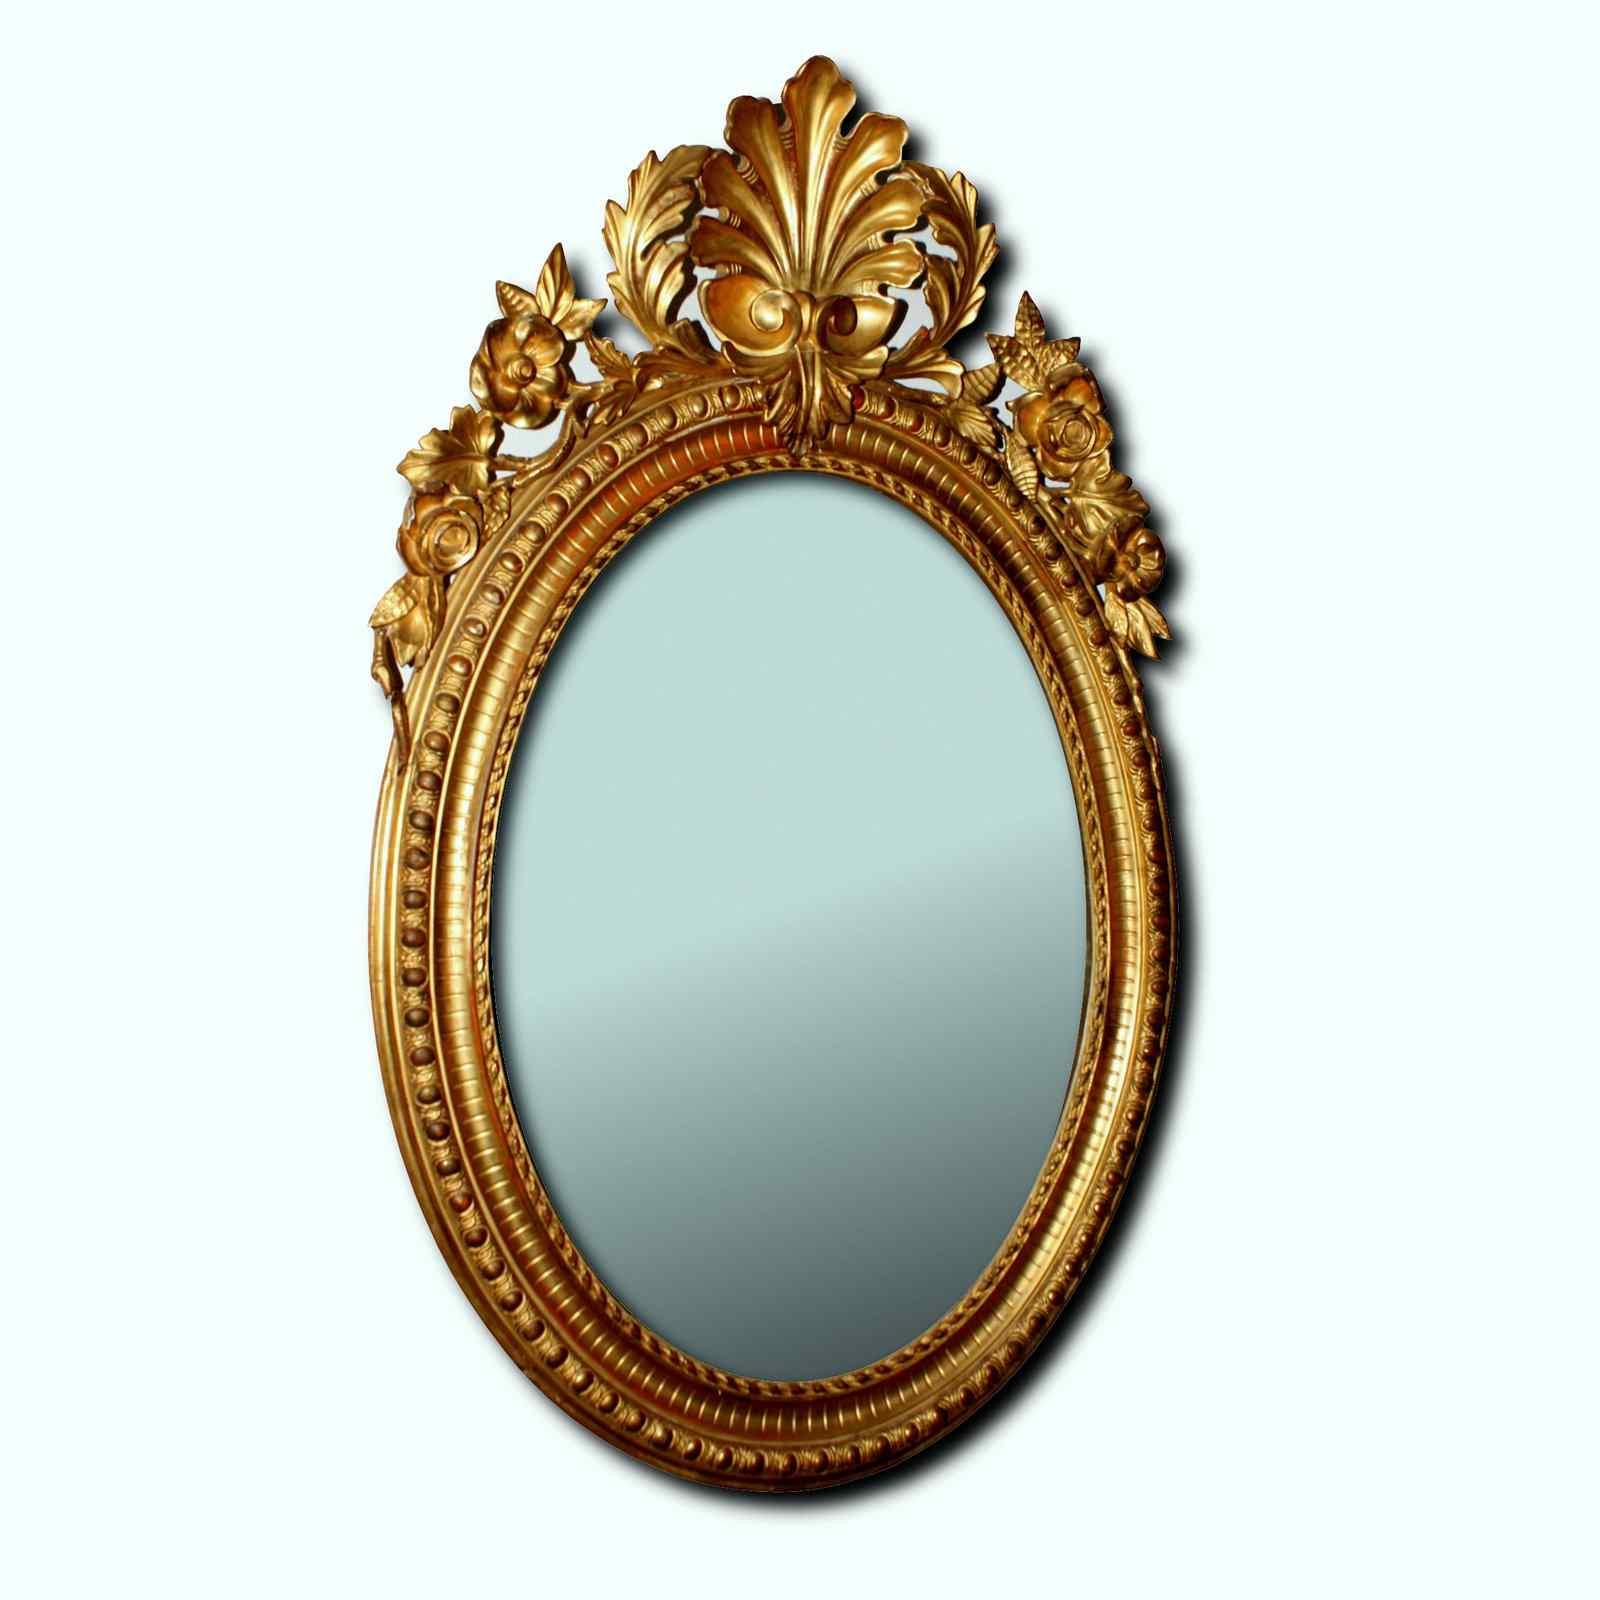 Miroir ancien du XIXème siècle